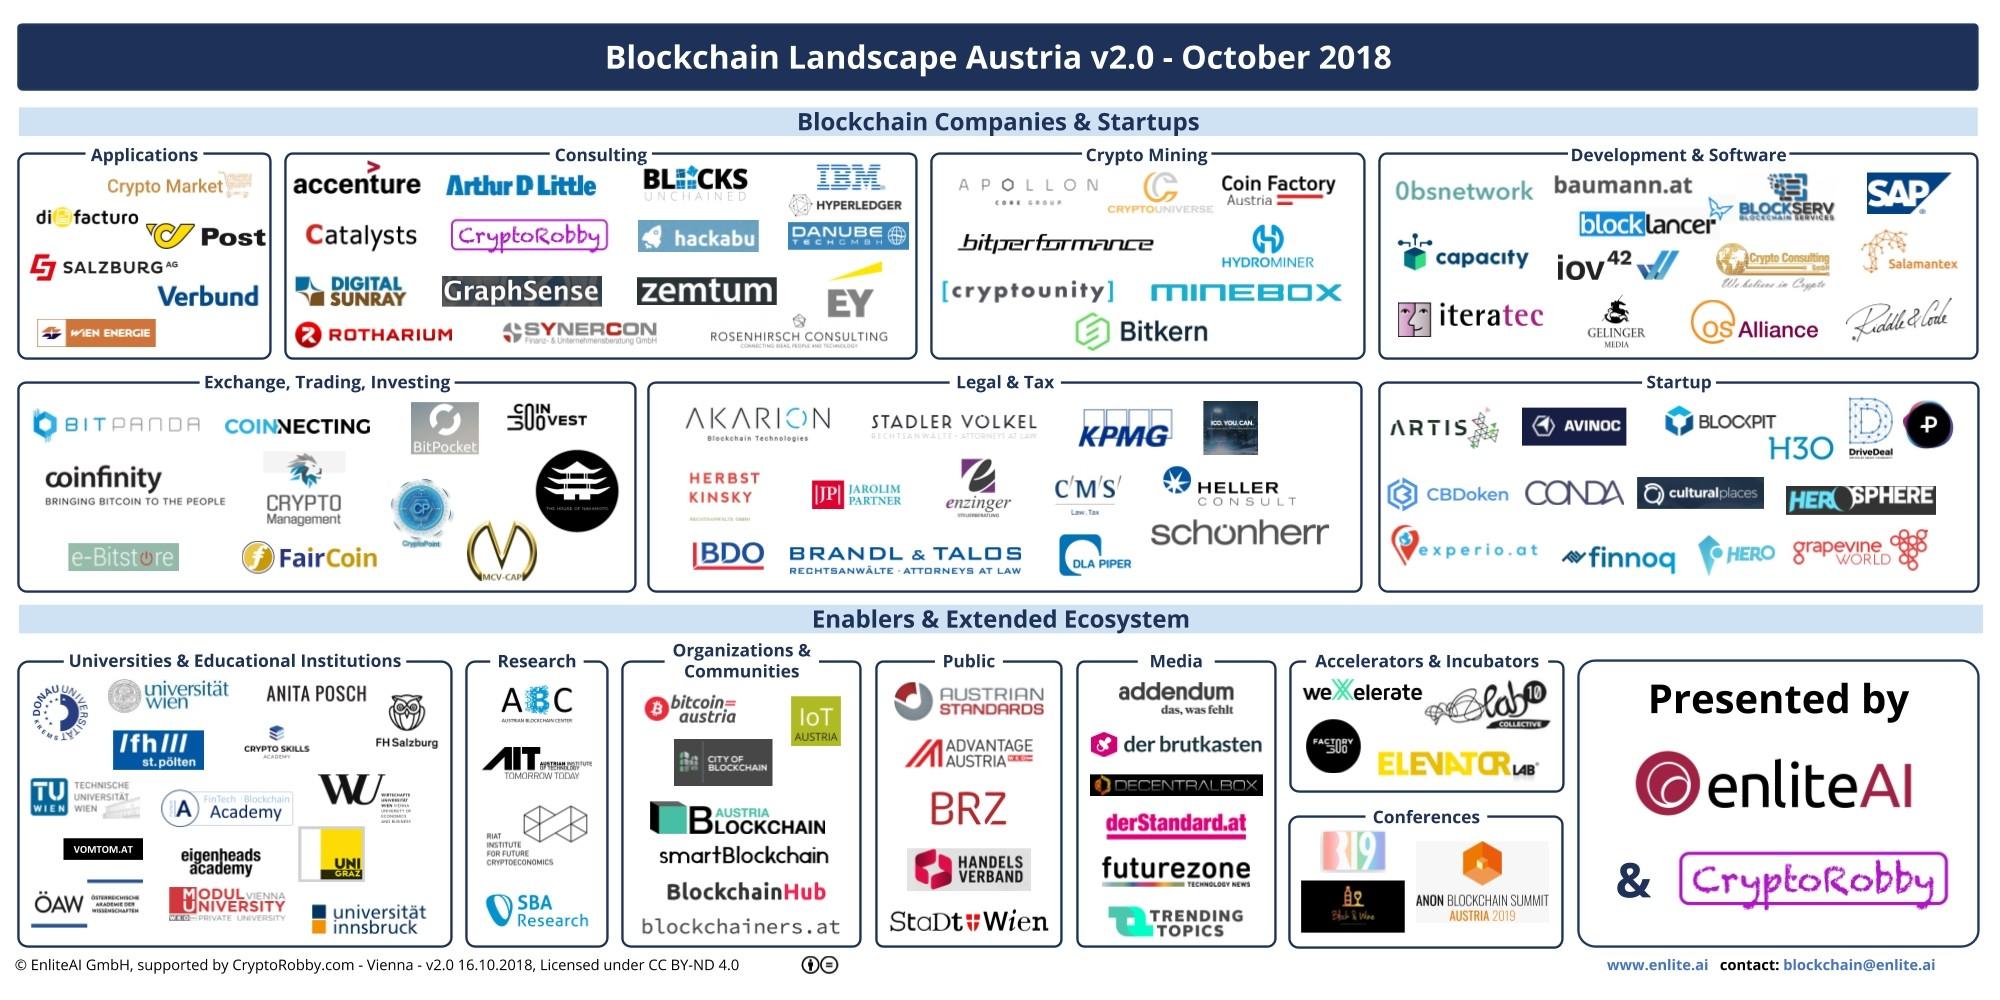 Blockchain Landscape Austria 2.0 - EnliteAI CryptoRobby